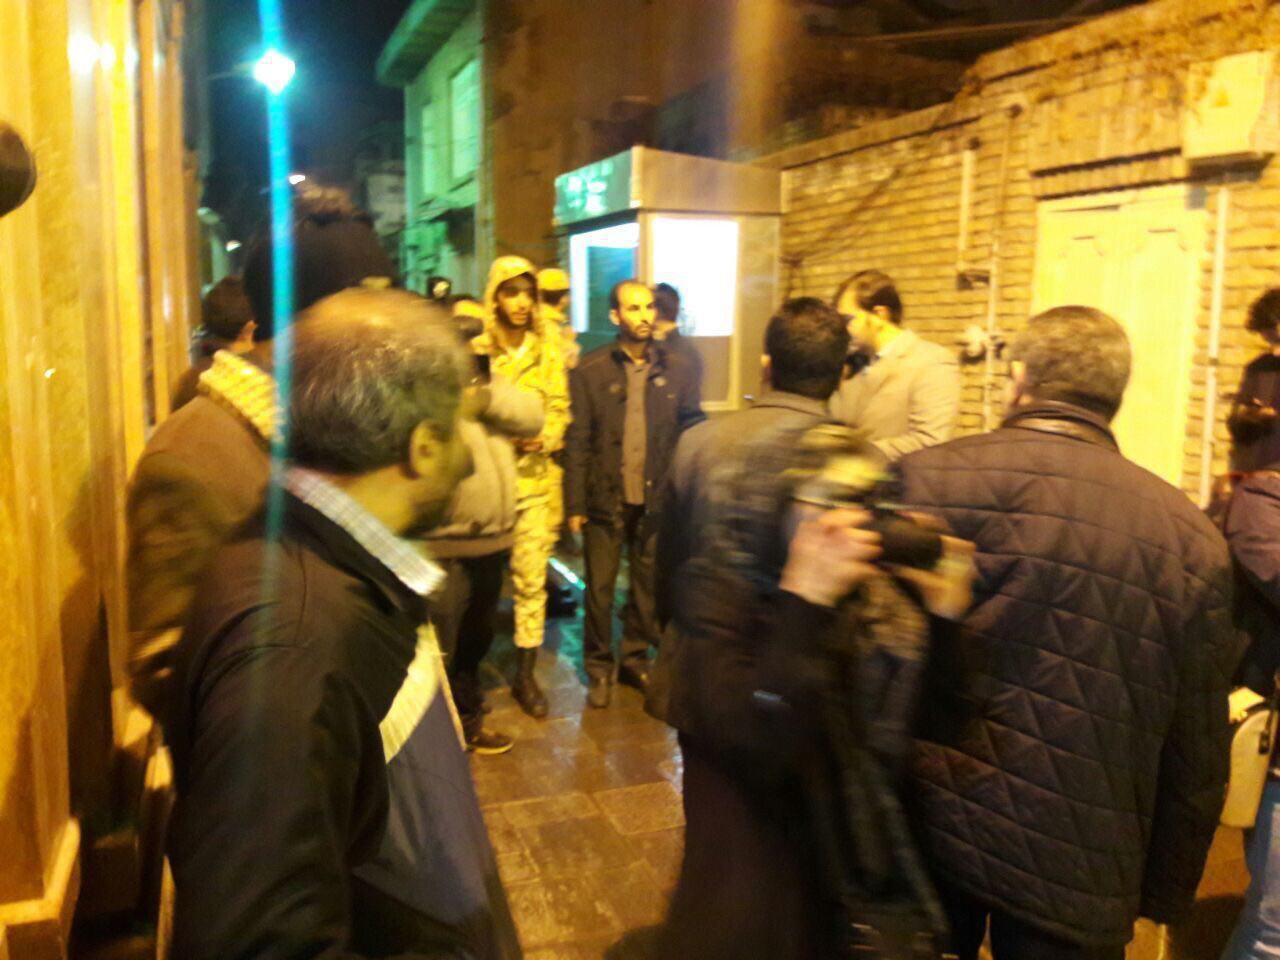 تصاویر : خانه مجلل رفسنجانی ثروتمند